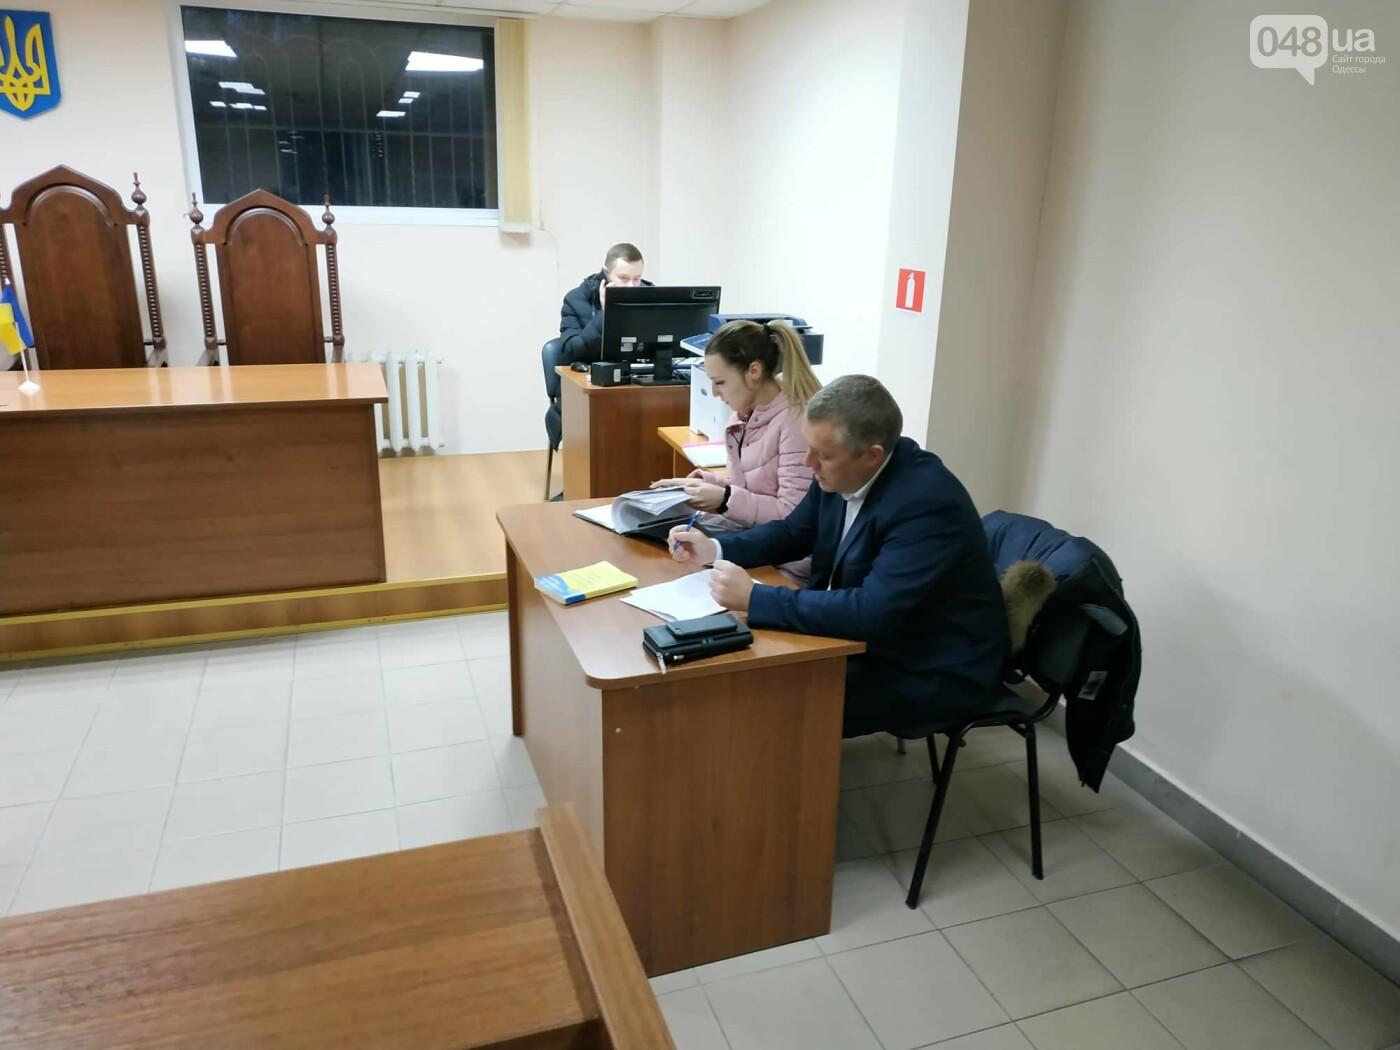 Одесскому псевдо-активисту избрали меру пресечения, - ФОТО, фото-2, Фото: Александр Жирносенко